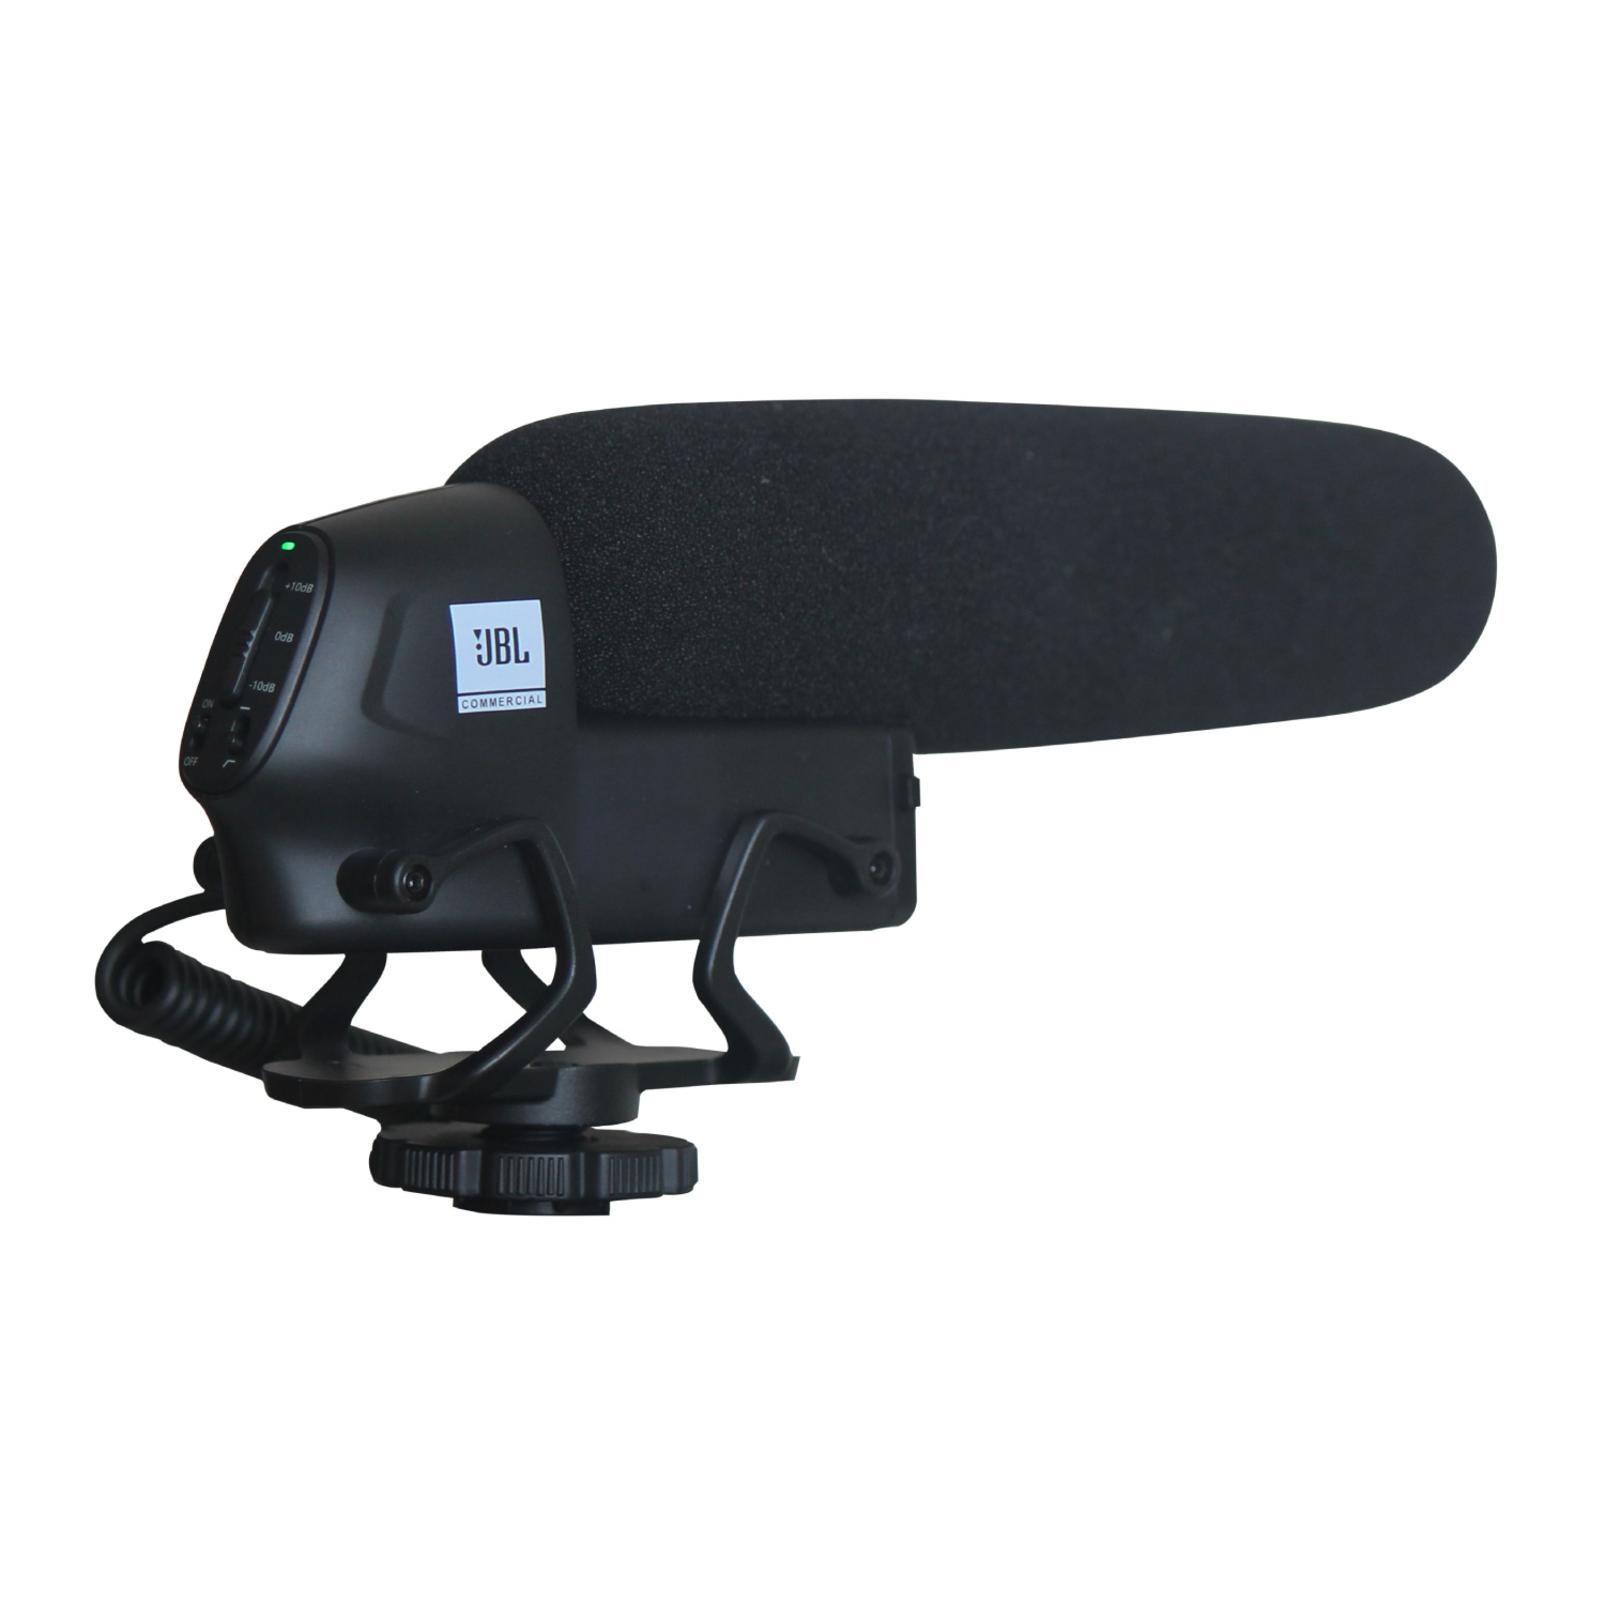 CSSG20 - Black - On-Camera Shotgun Microphone - Detailshot 1